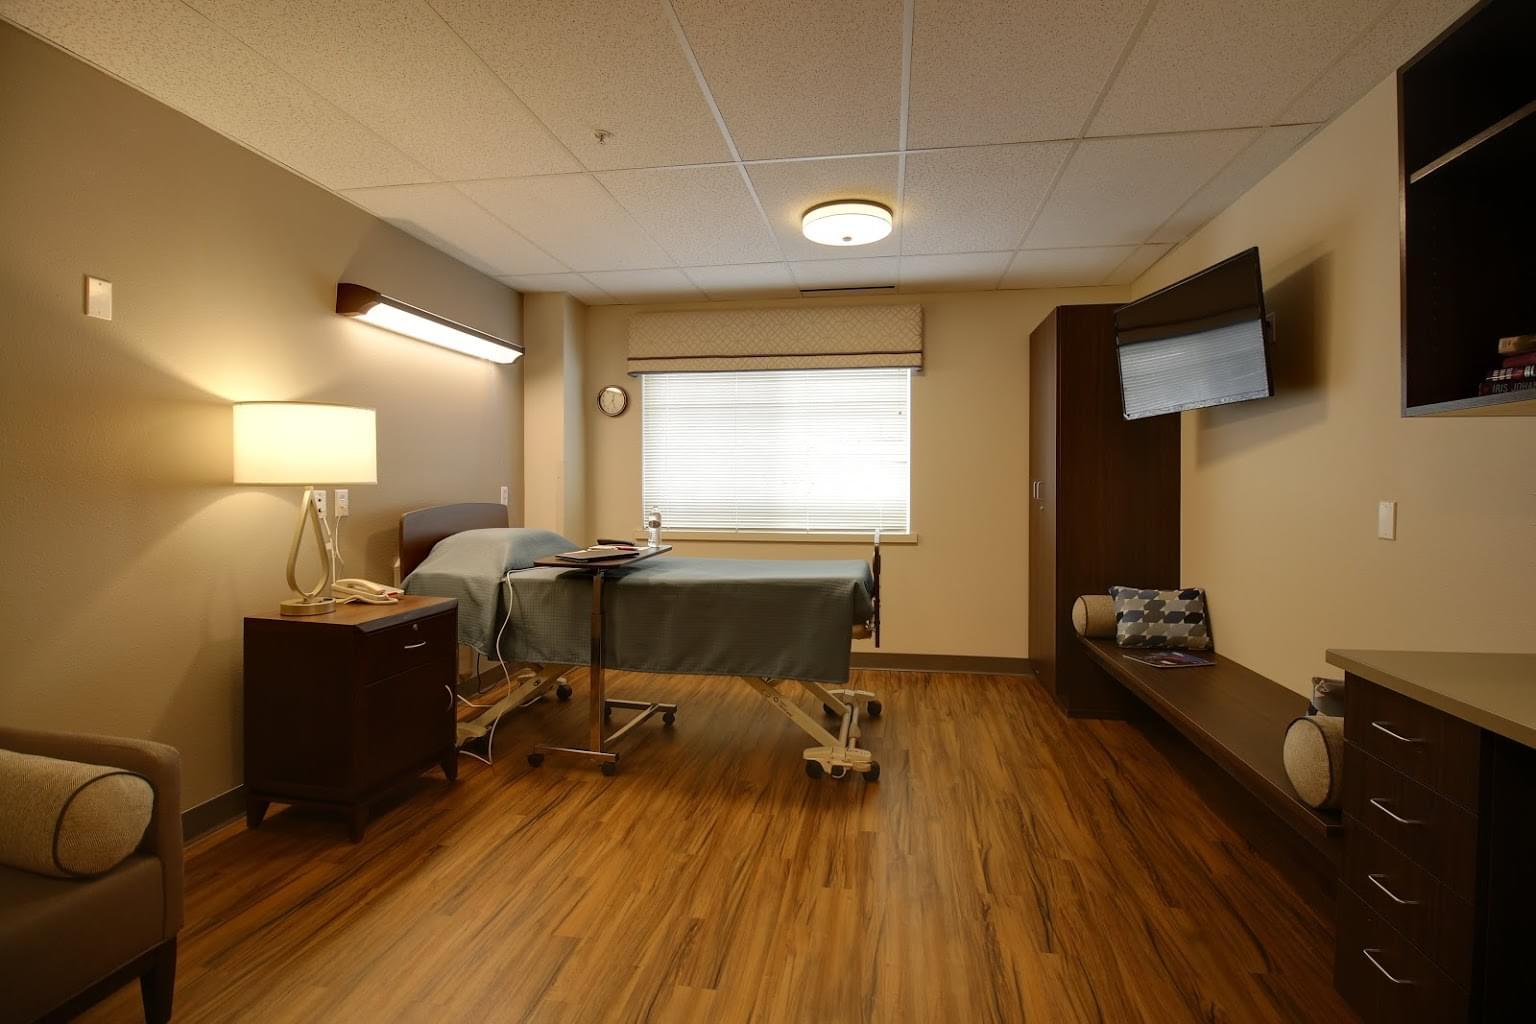 Mission Healthcare at Bellevue, WA rehabilitation center bedroom